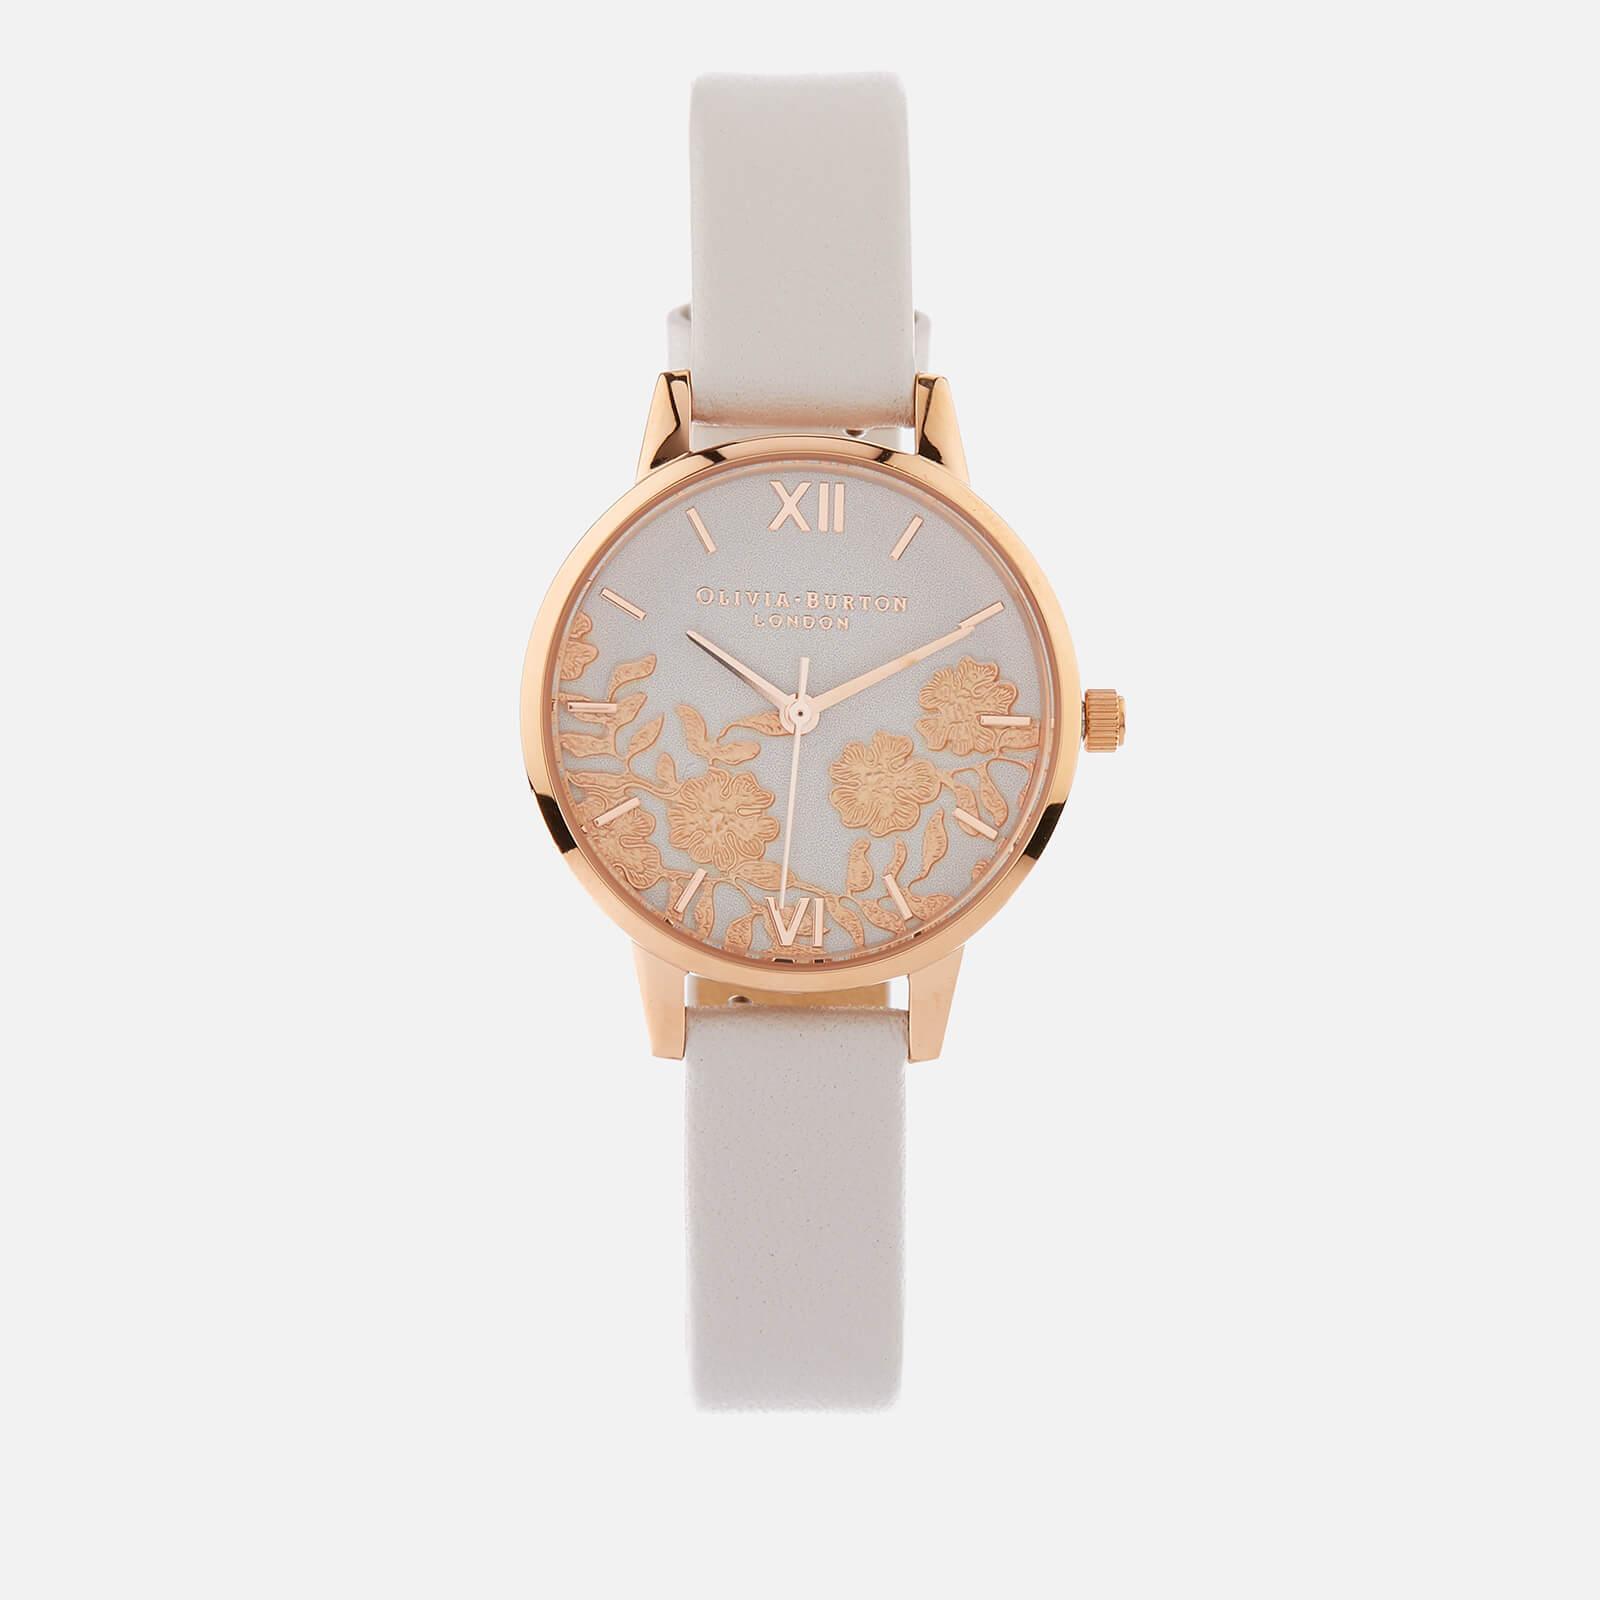 Olivia Burton Women's Lace Detail Watch - Blush/Rose Gold